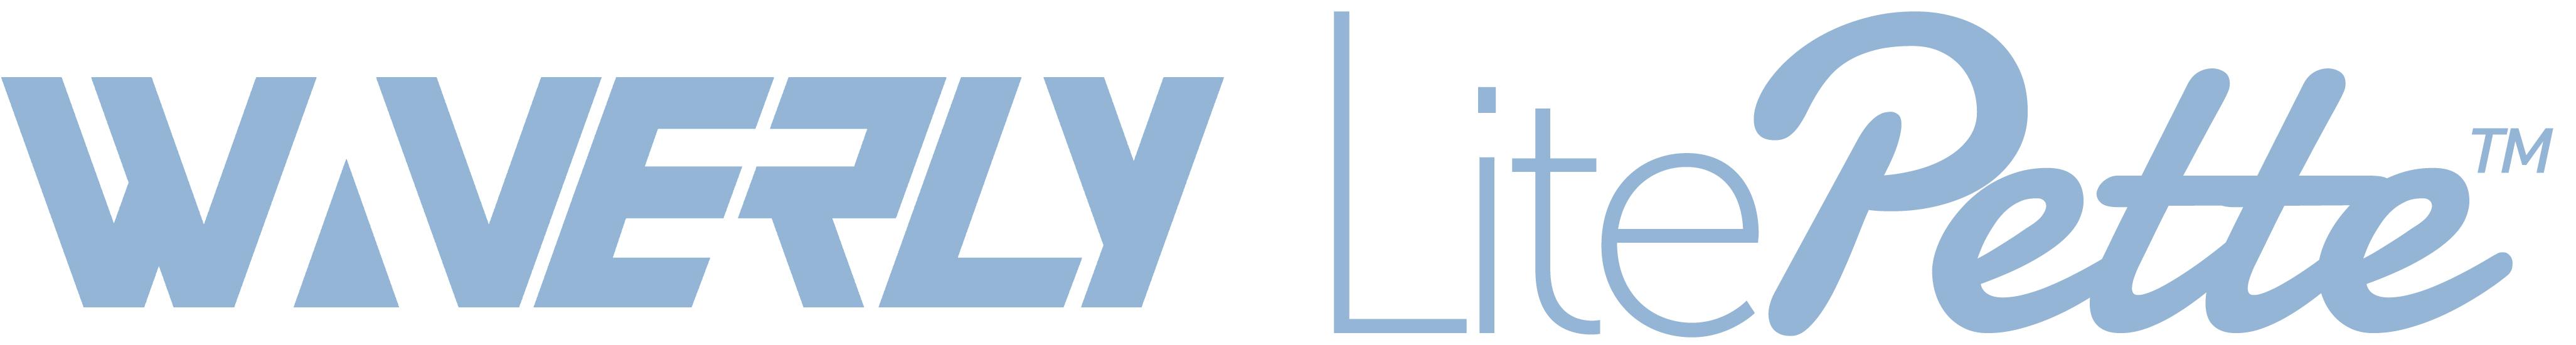 Waverly LitePette logo